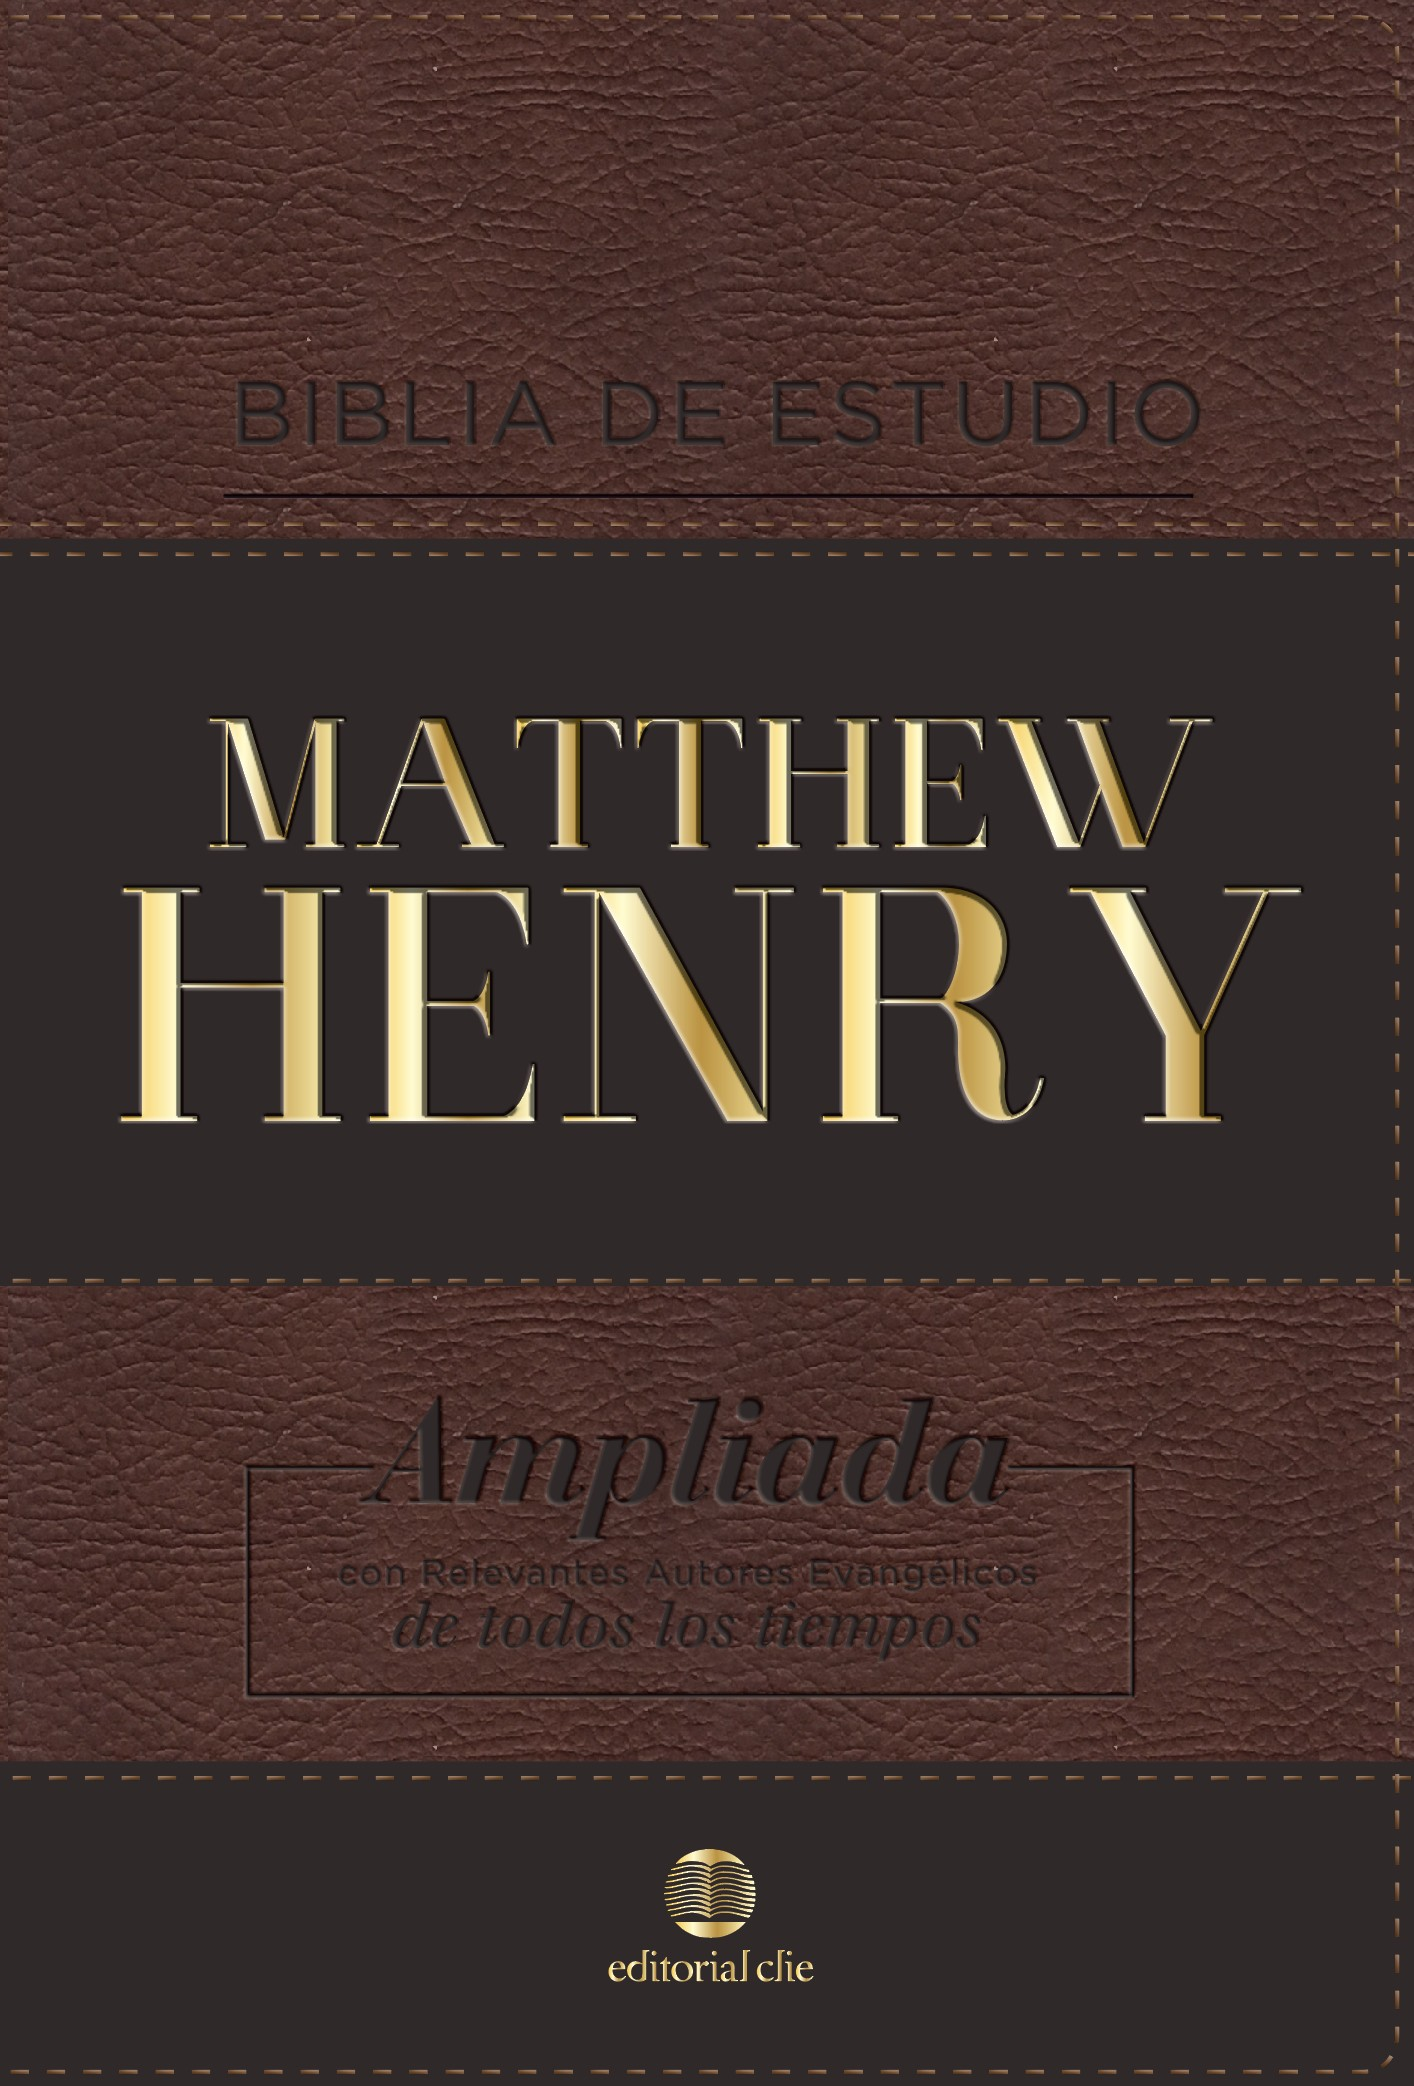 BIBLIA DE ESTUDIO MATTHEW HENRY (Leathersoft Clásica/ sin índice)